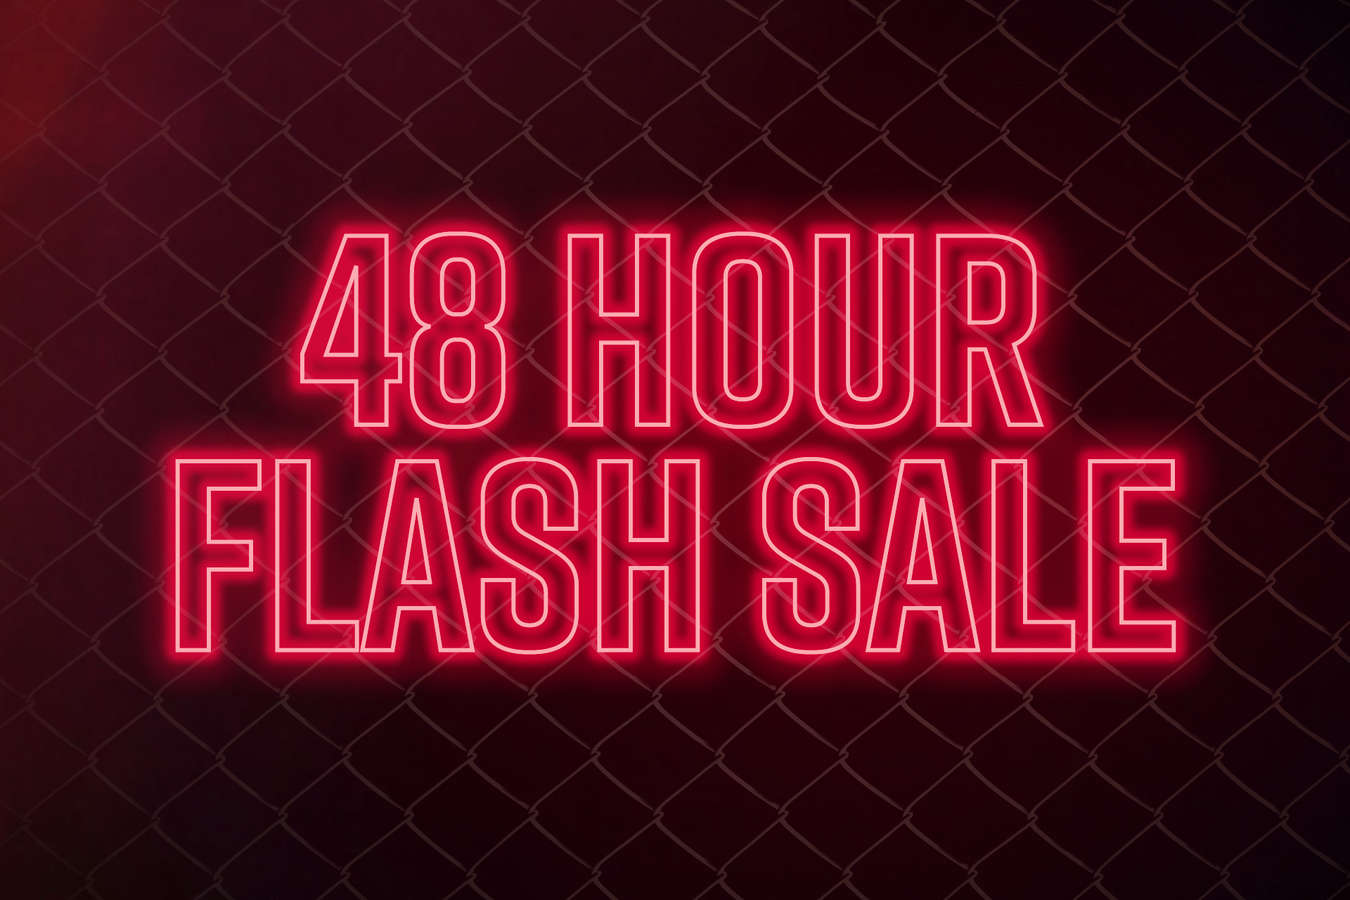 48 hr flash sale.jpg